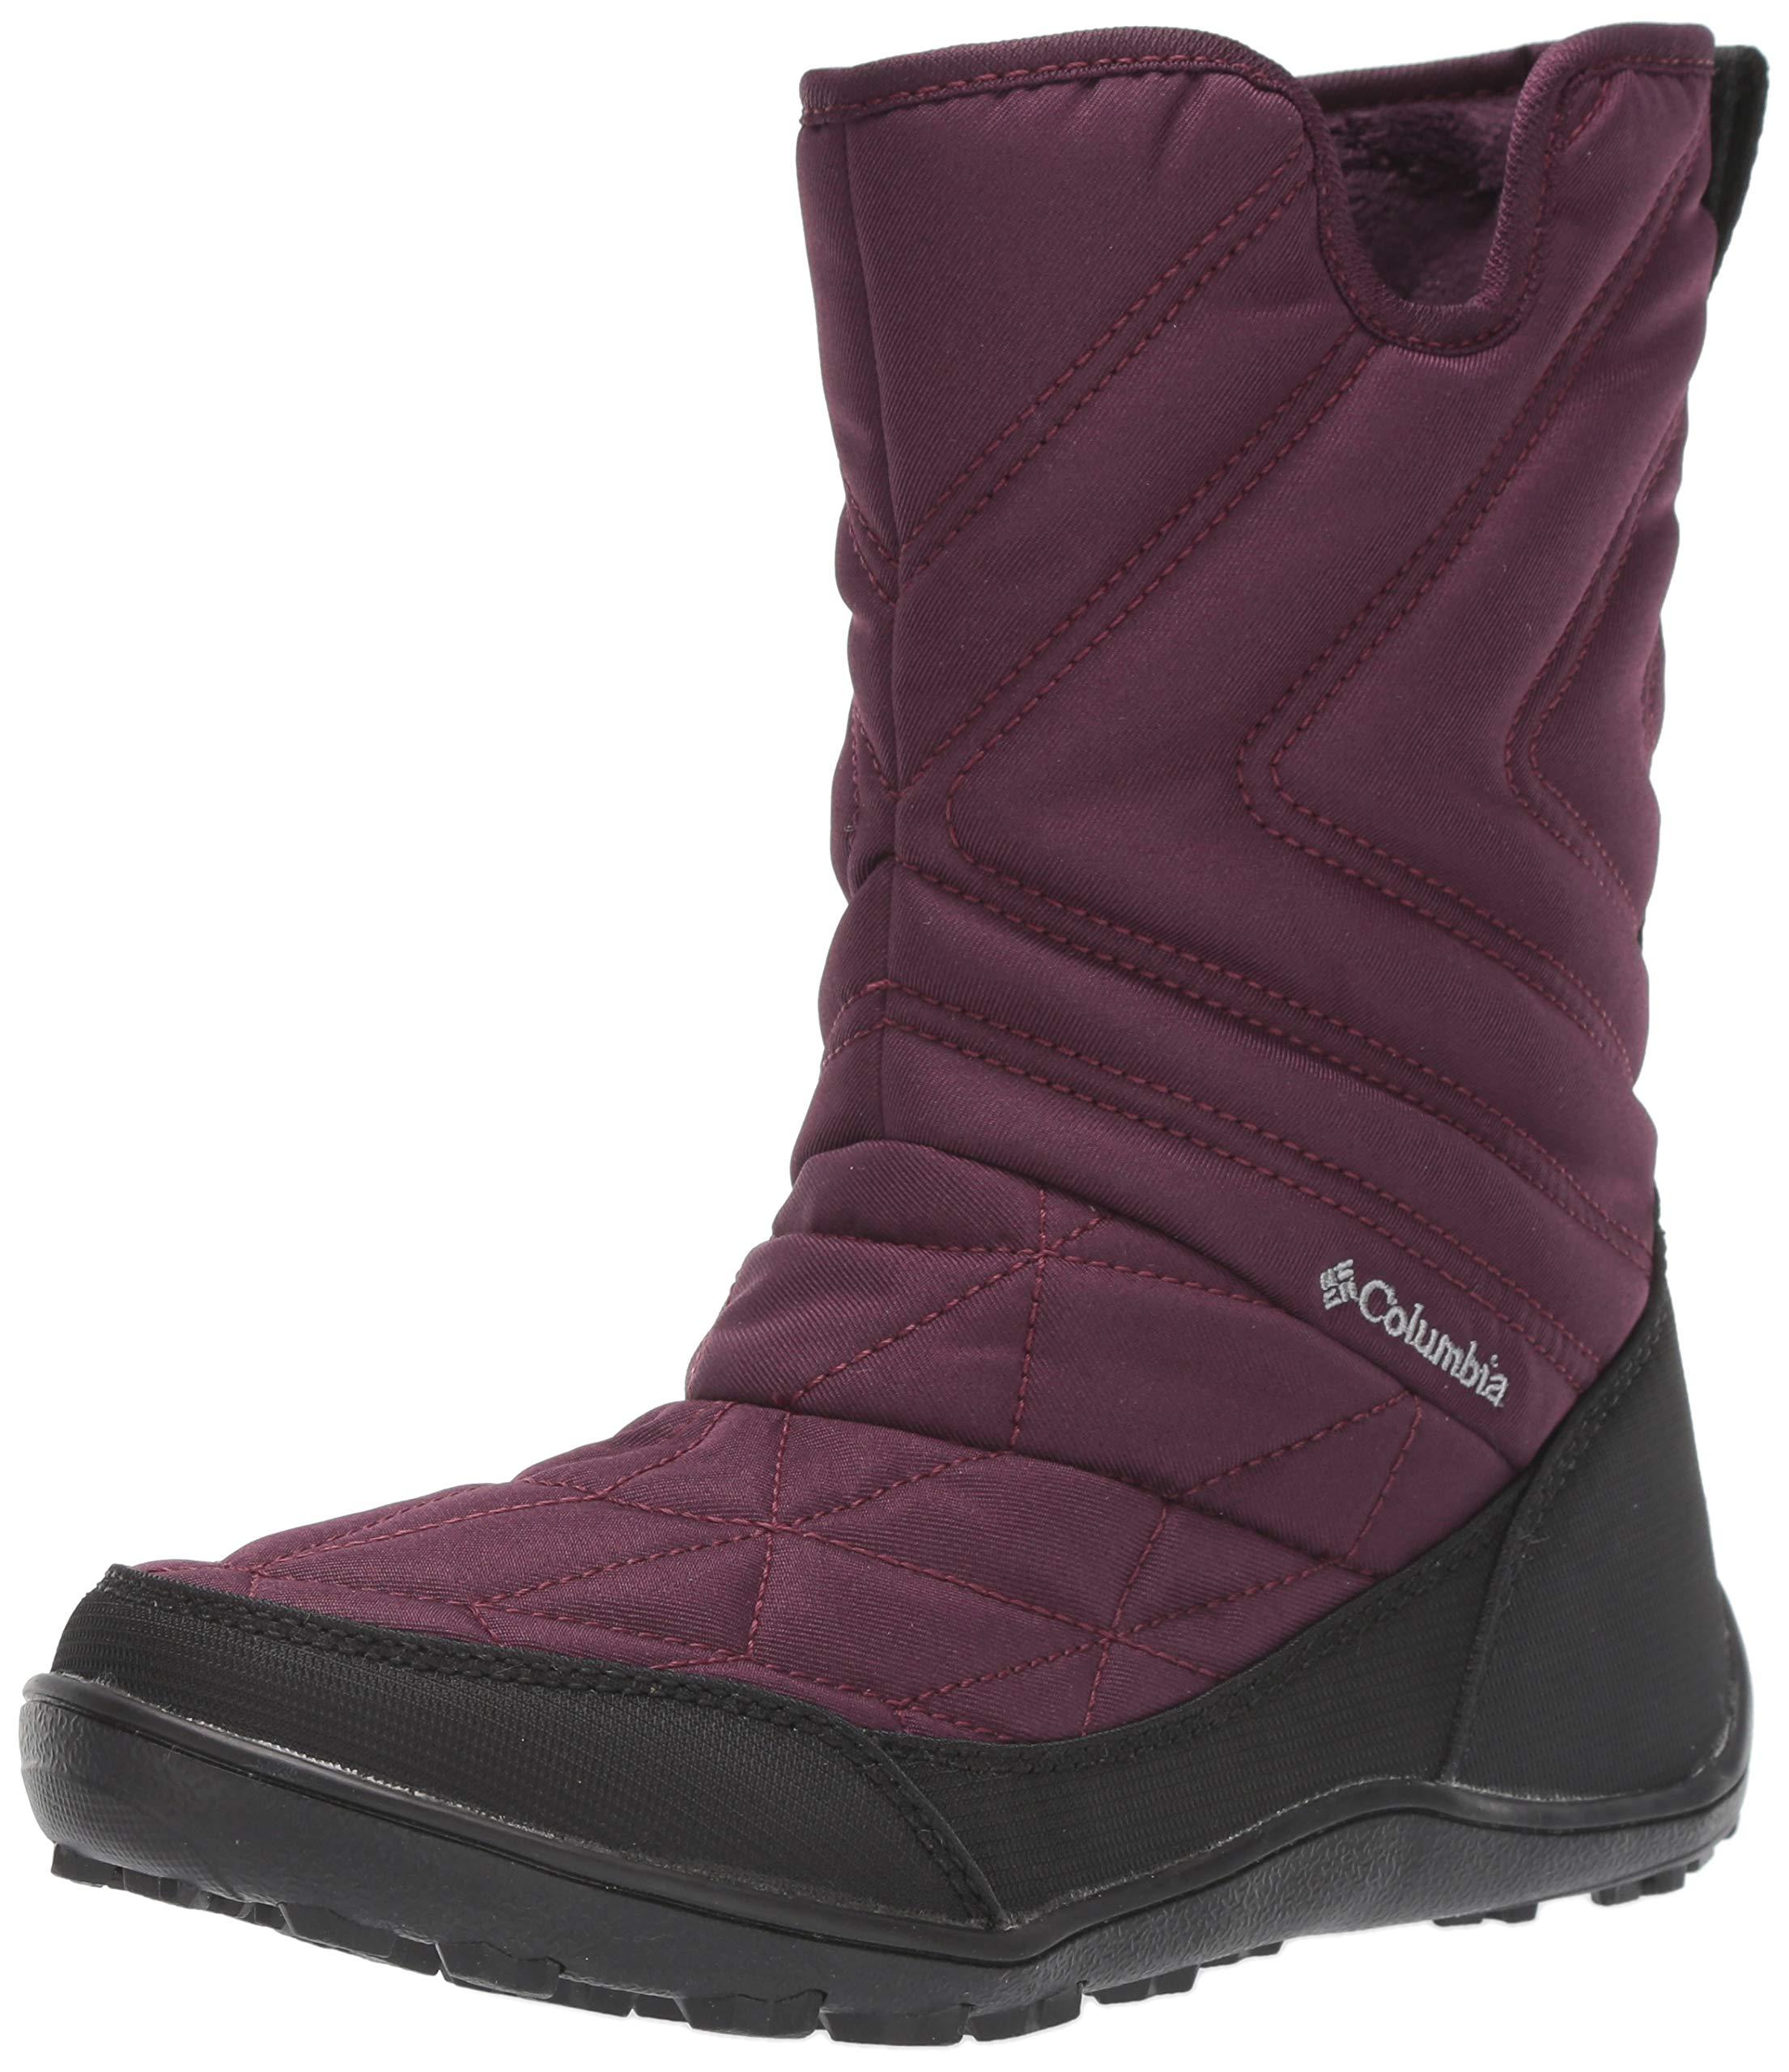 Columbia Women's Minx Slip III Snow Boot, Black Cherry, Grey, 10 Regular US by Columbia